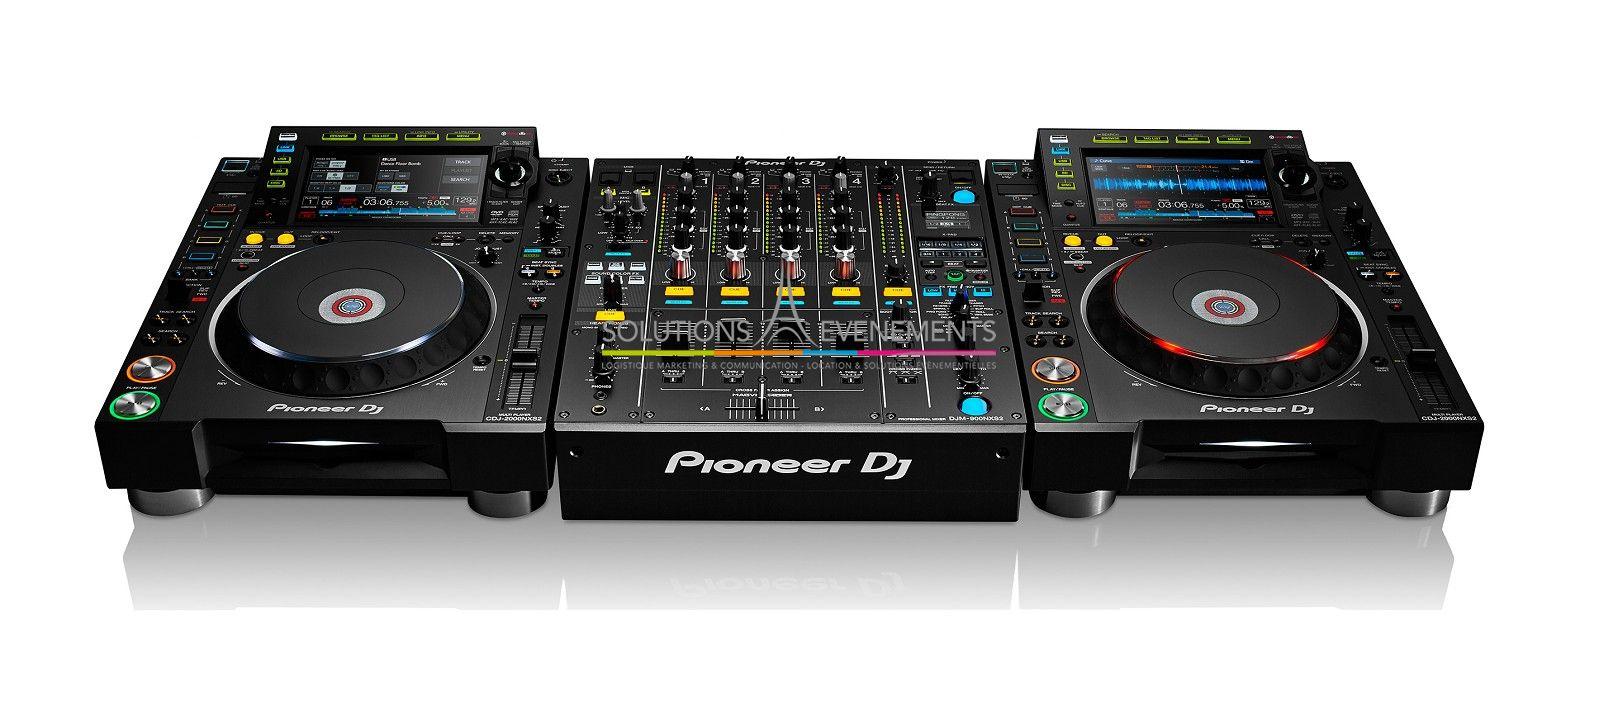 Location regie dj pro pioneer cdj2000 et djm900 nxs 2 - Table de mixage pioneer djm 2000 ...